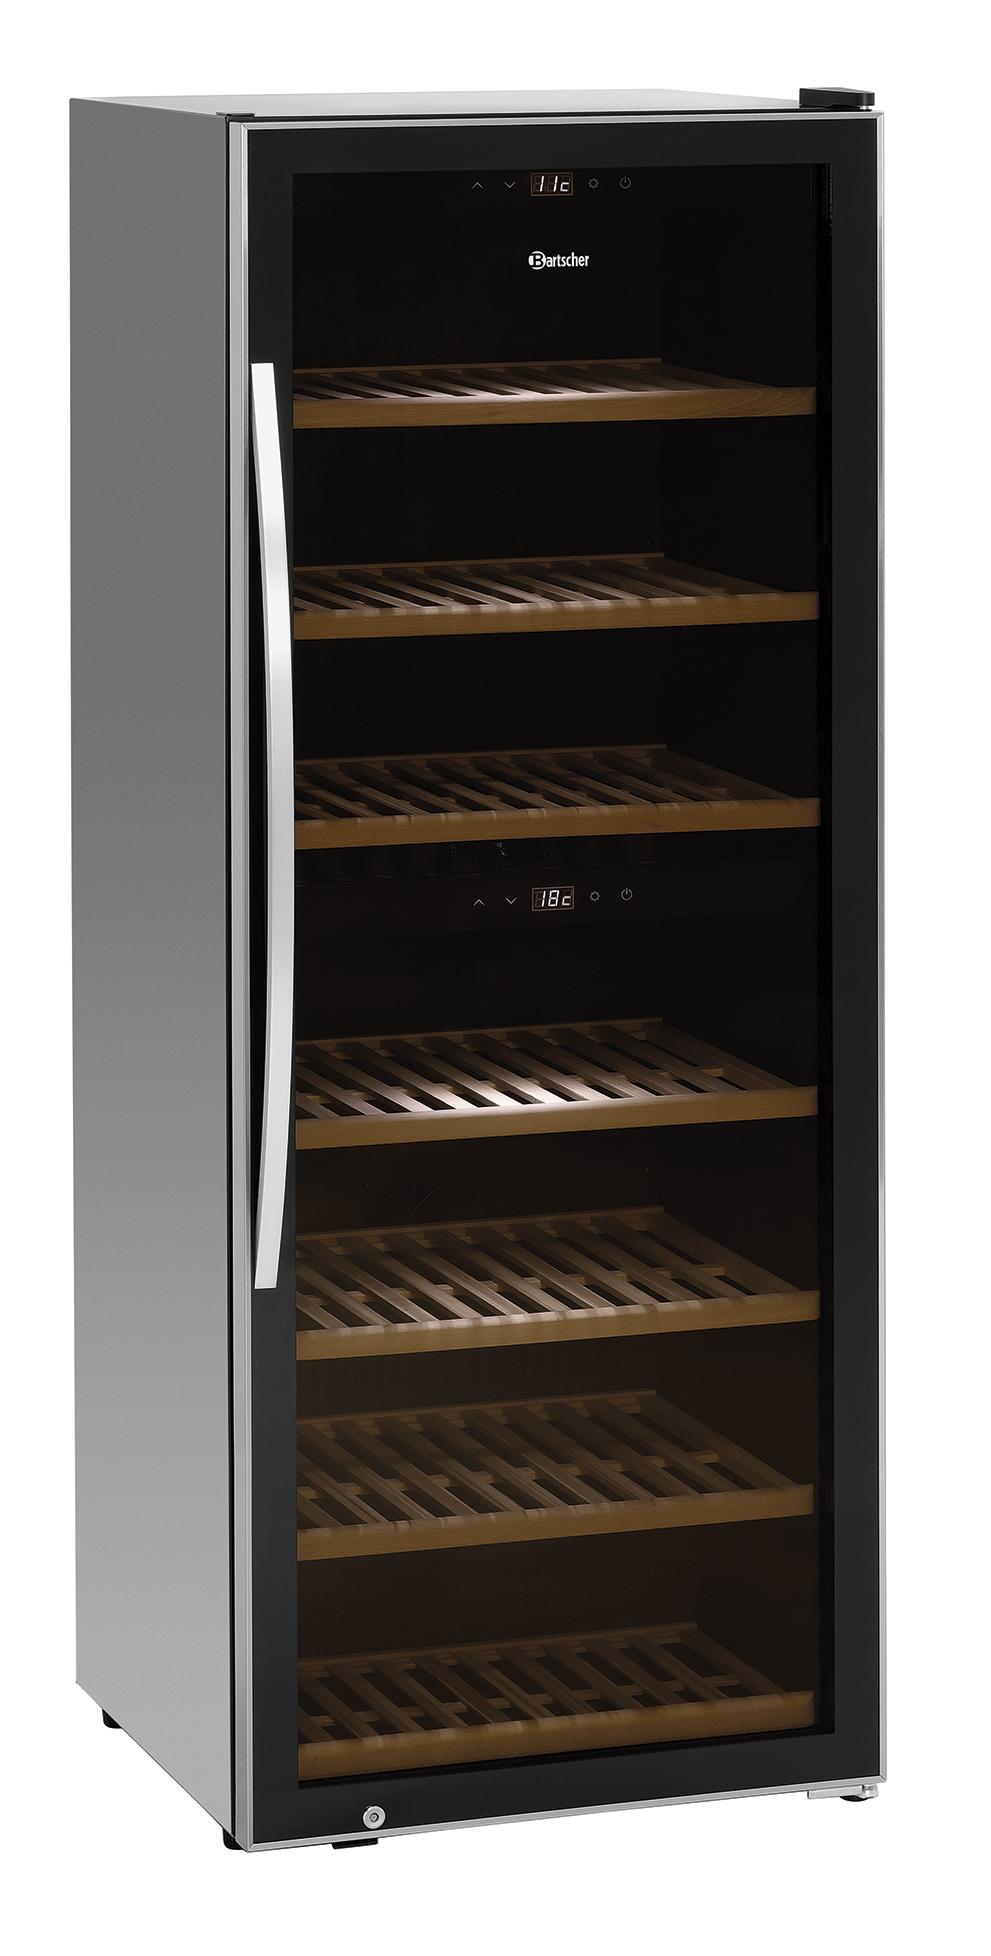 Bartscher Wijnkoelkast 2 Zones 126FL - 313 liter - Zwart